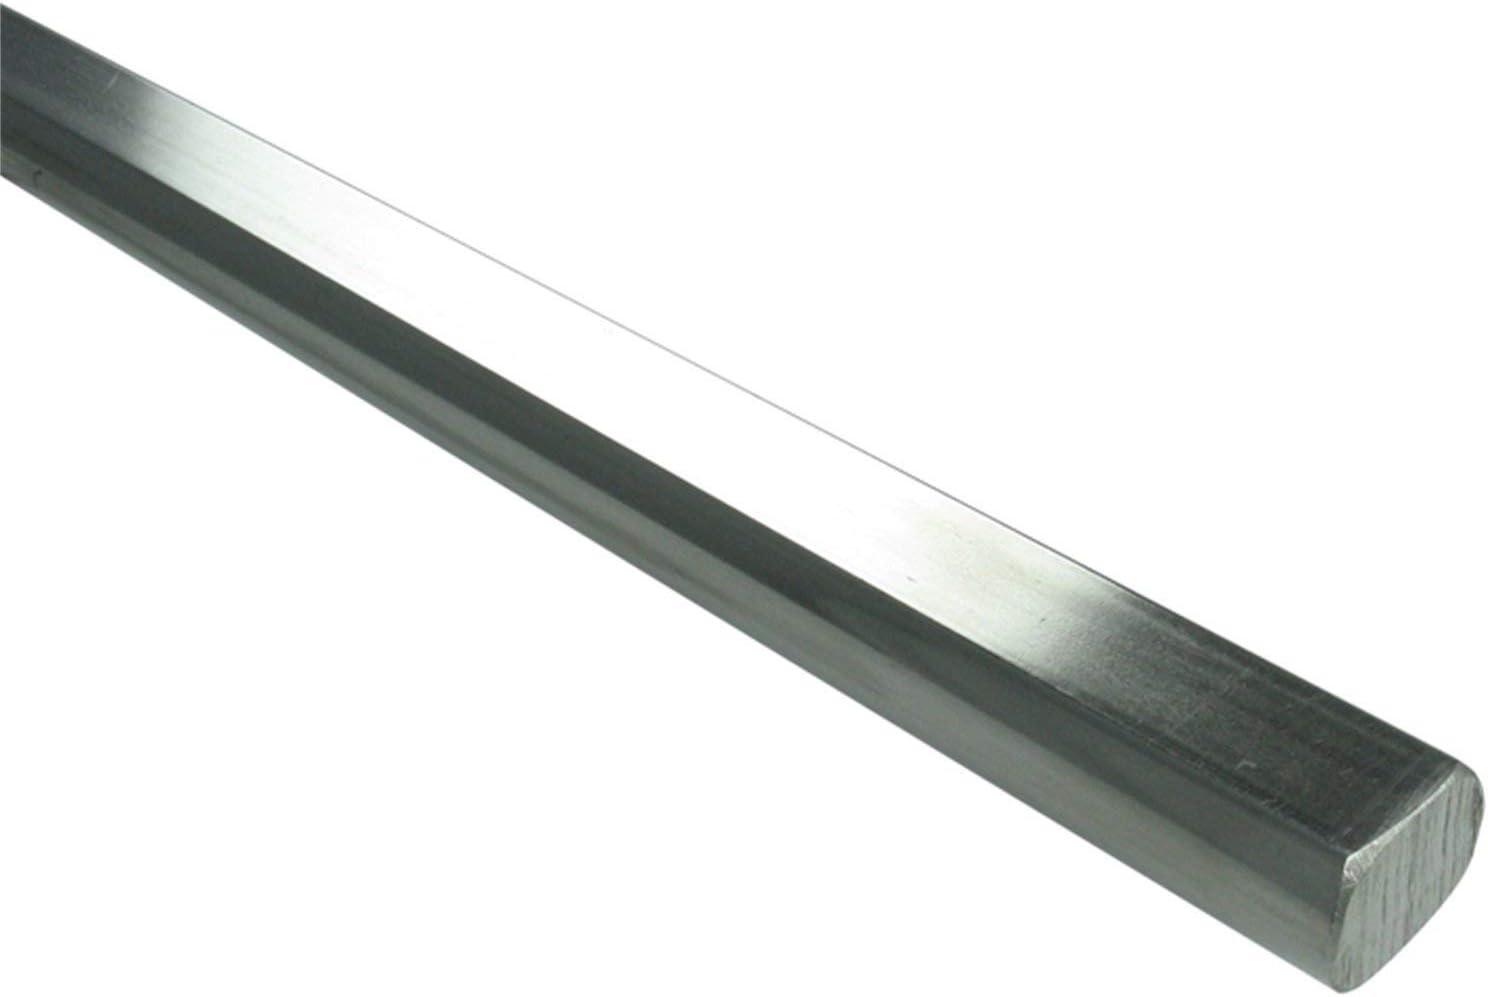 Borgeson 000872 Steering Shaft